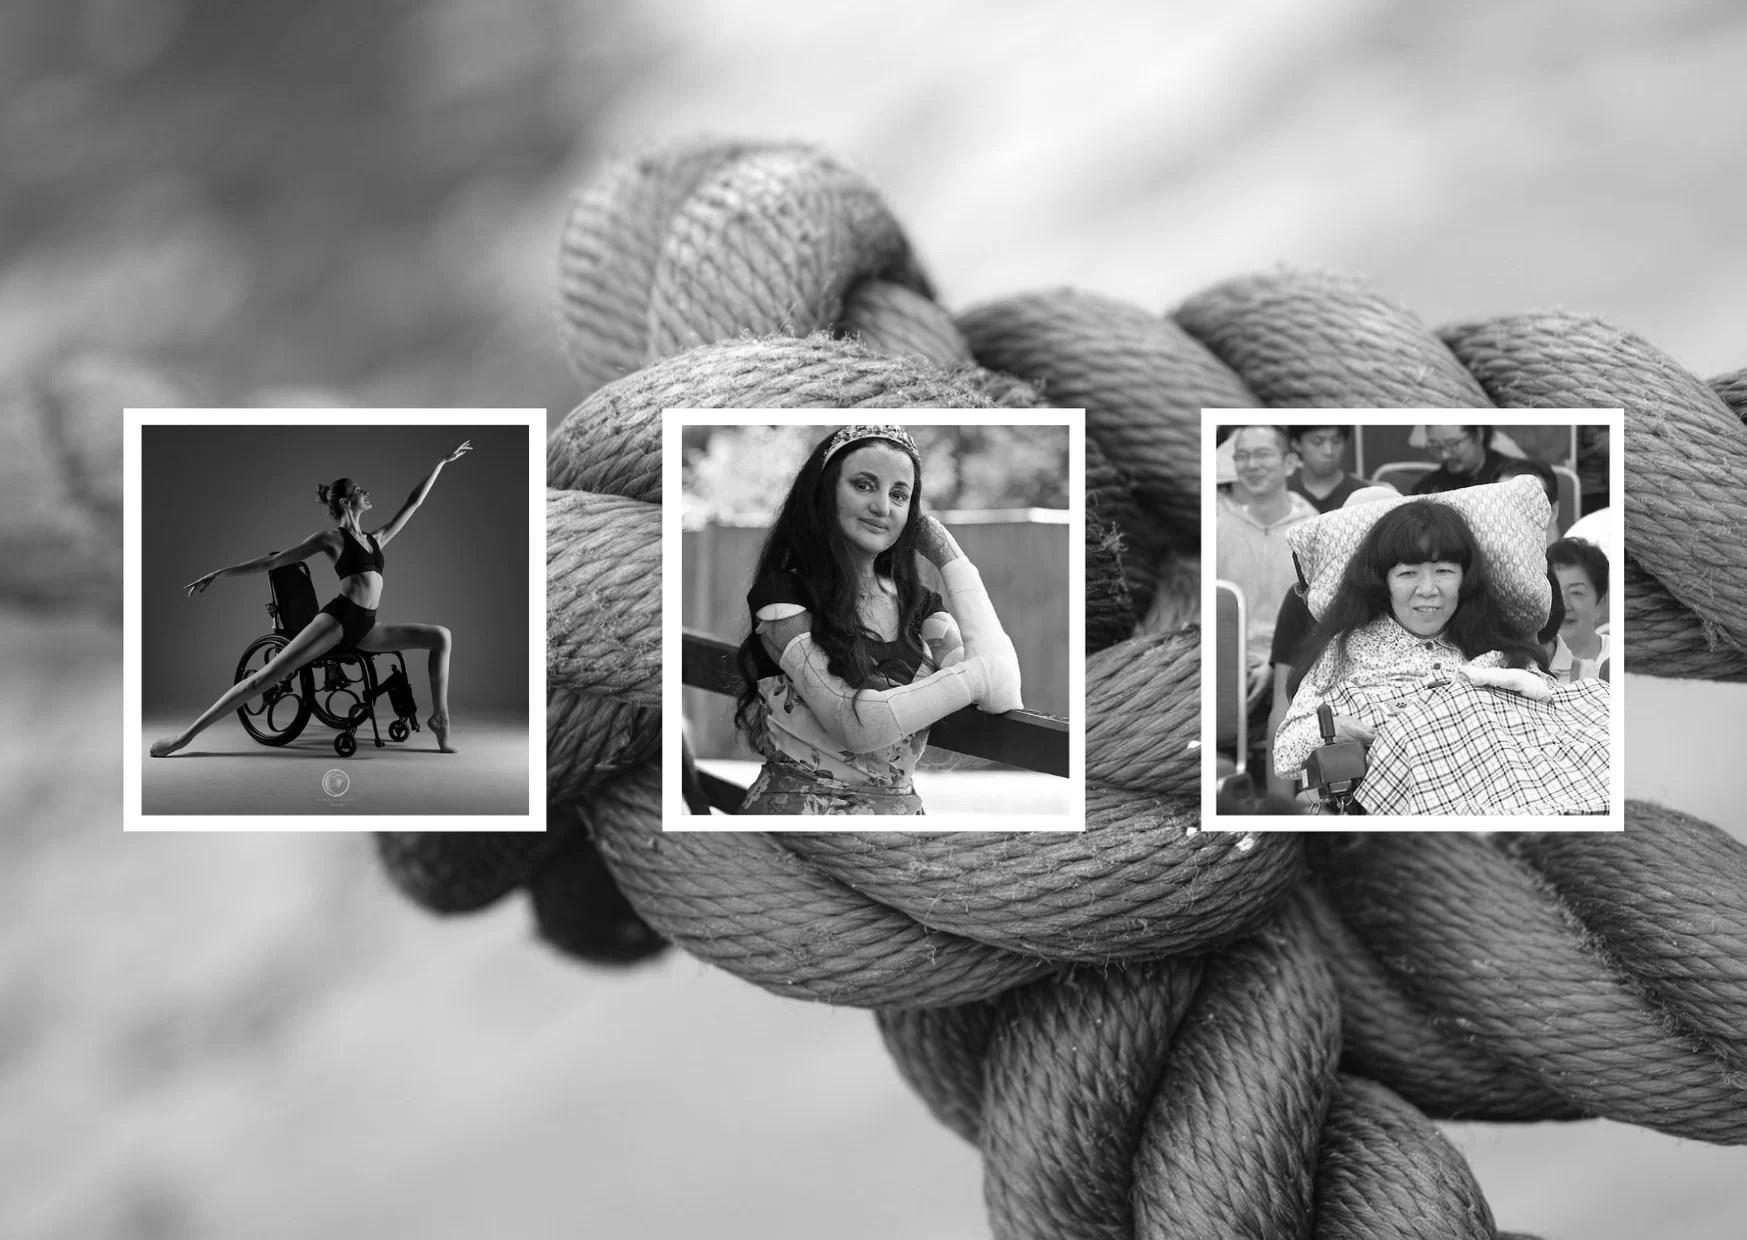 3 Inspirational Disabled Heroines for International Women's Day 2021